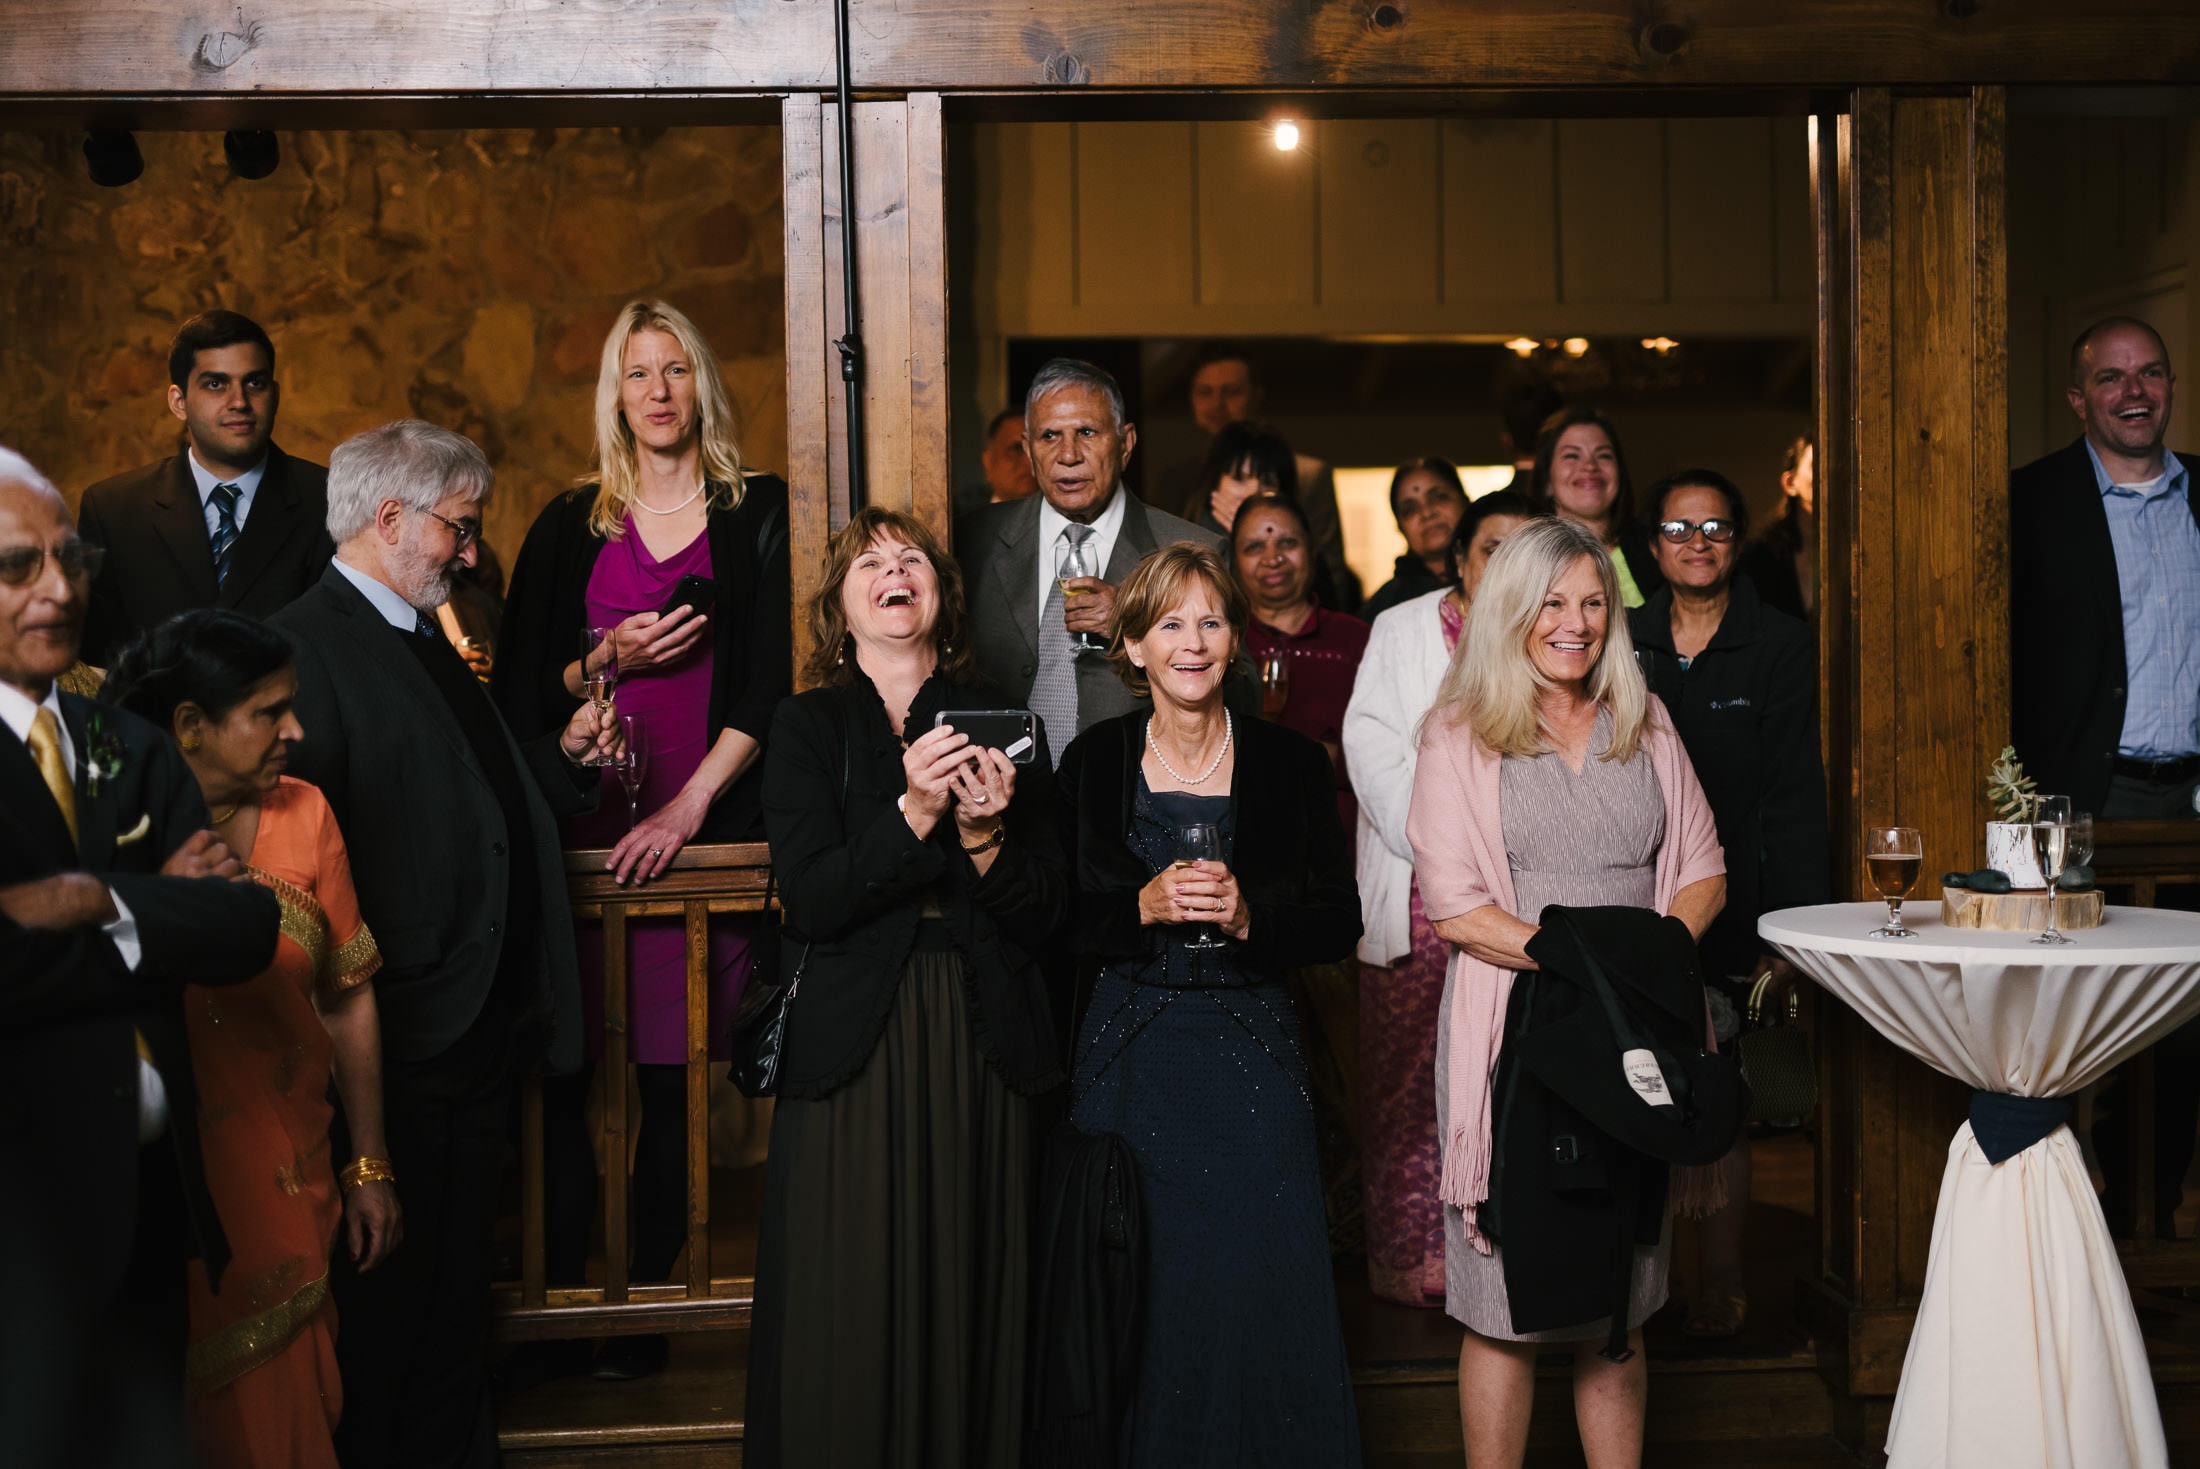 Wedding reception at the Mountain Terrace